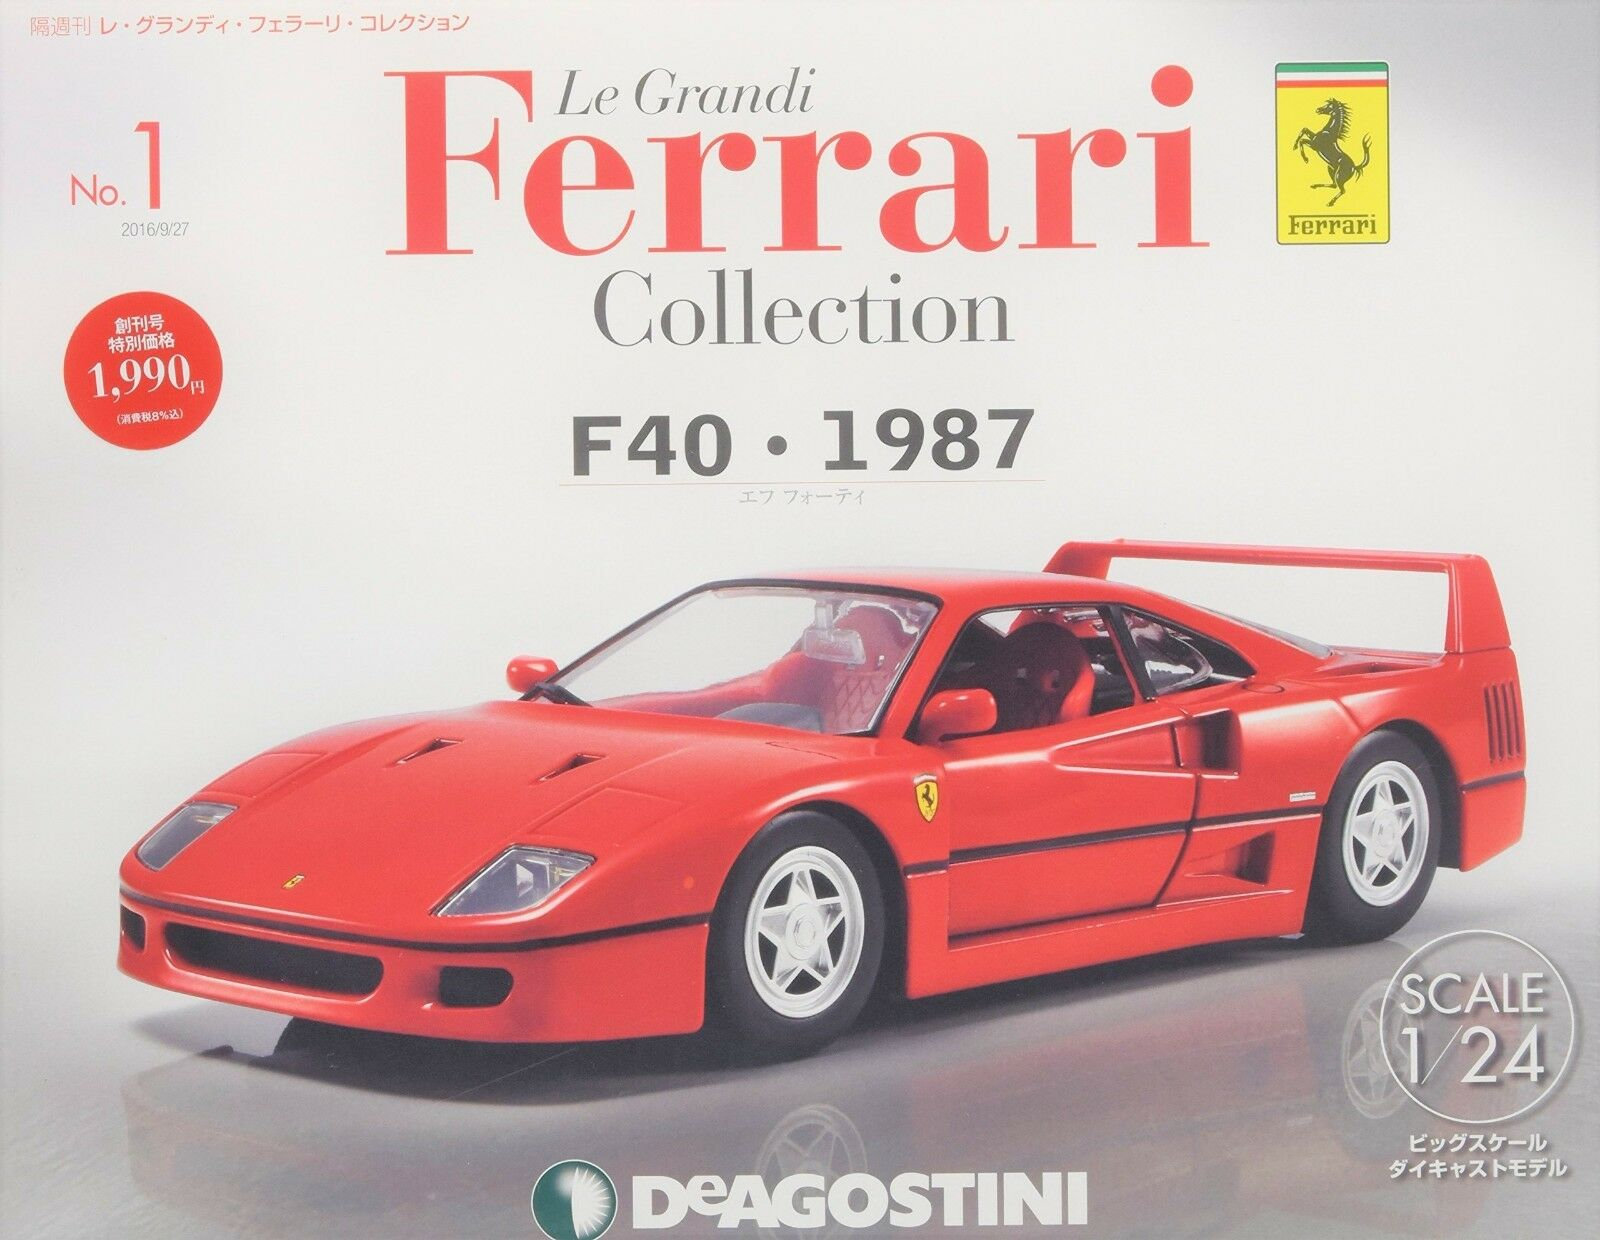 Deagostini le grandi ferrari - sammlung nr. 1 1   24 ferrari f40 1987